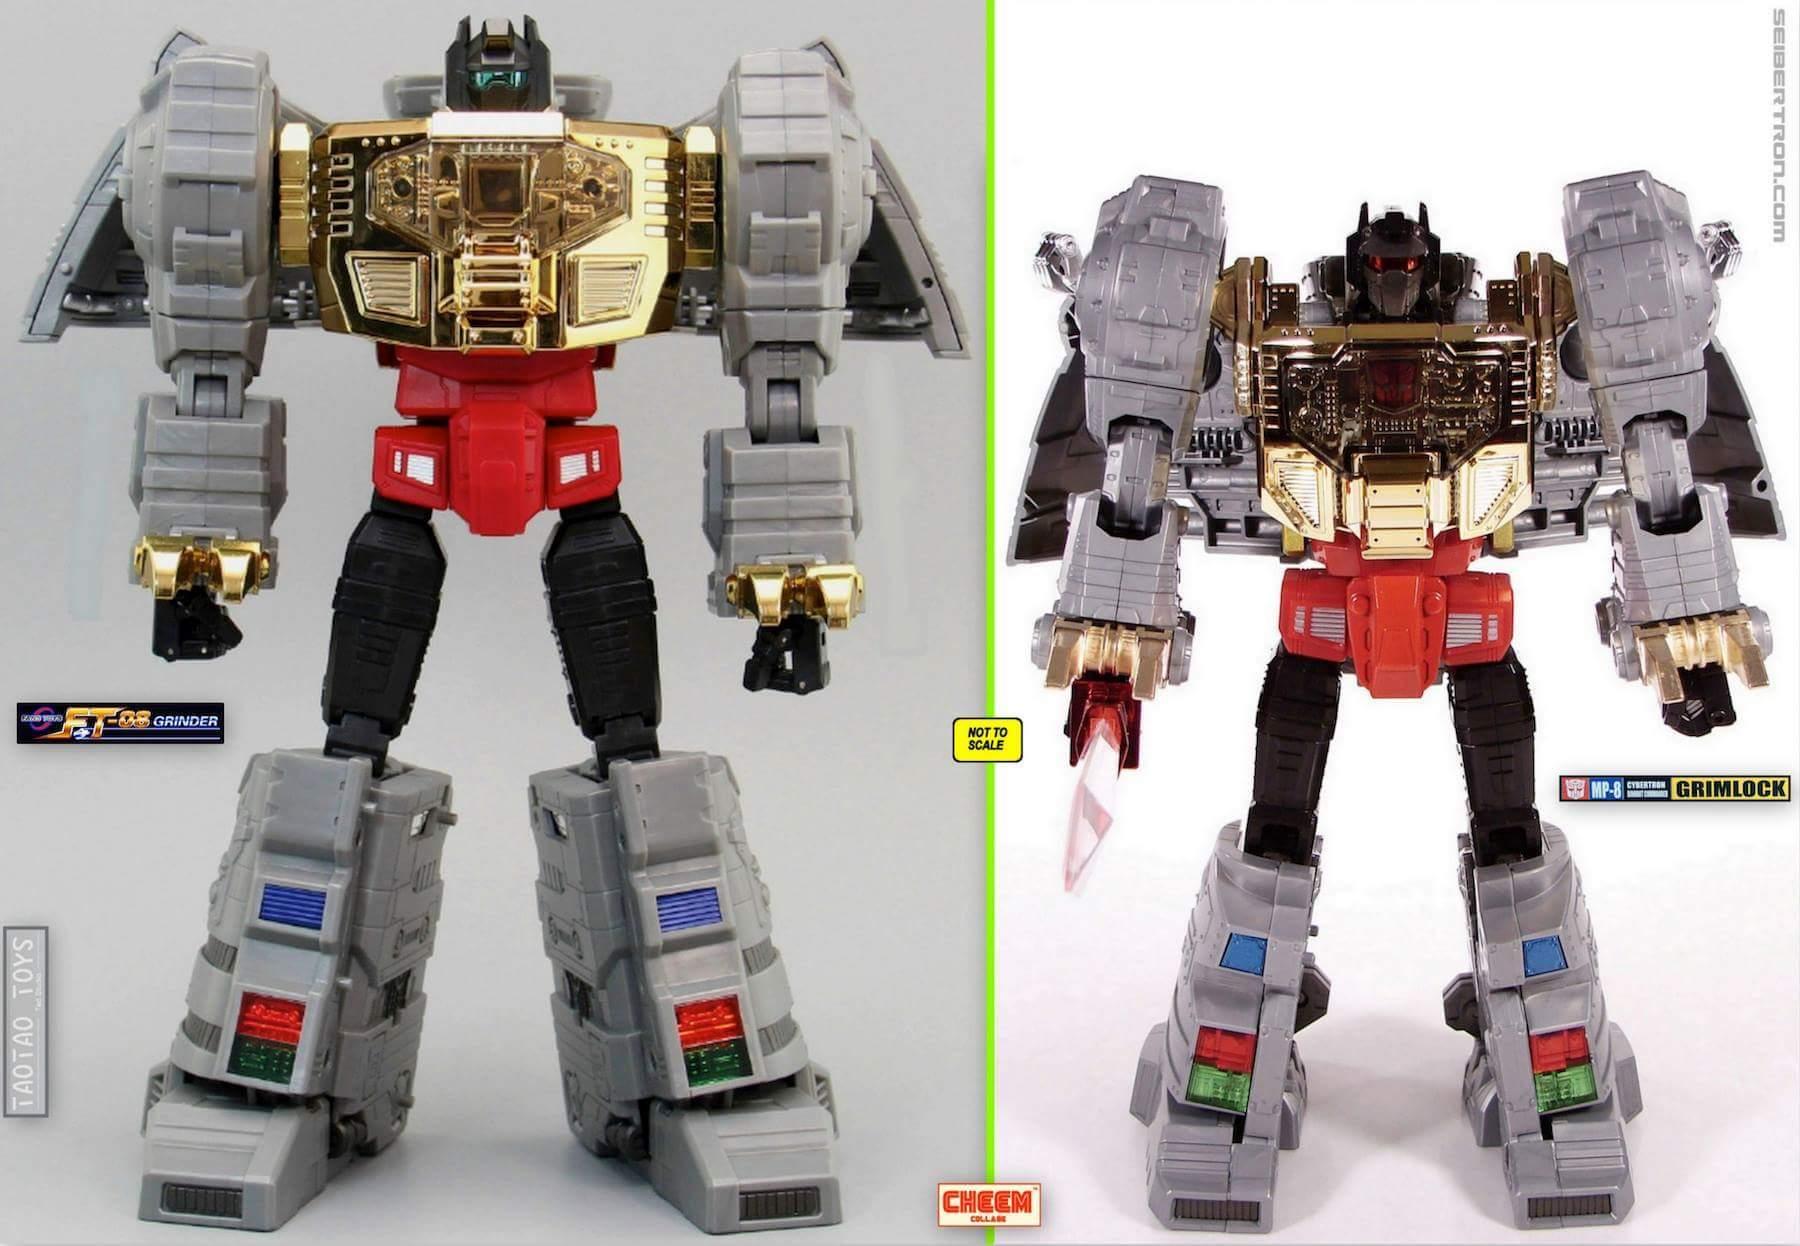 [Fanstoys] Produit Tiers - Dinobots - FT-04 Scoria, FT-05 Soar, FT-06 Sever, FT-07 Stomp, FT-08 Grinder - Page 10 Tffj02Fi